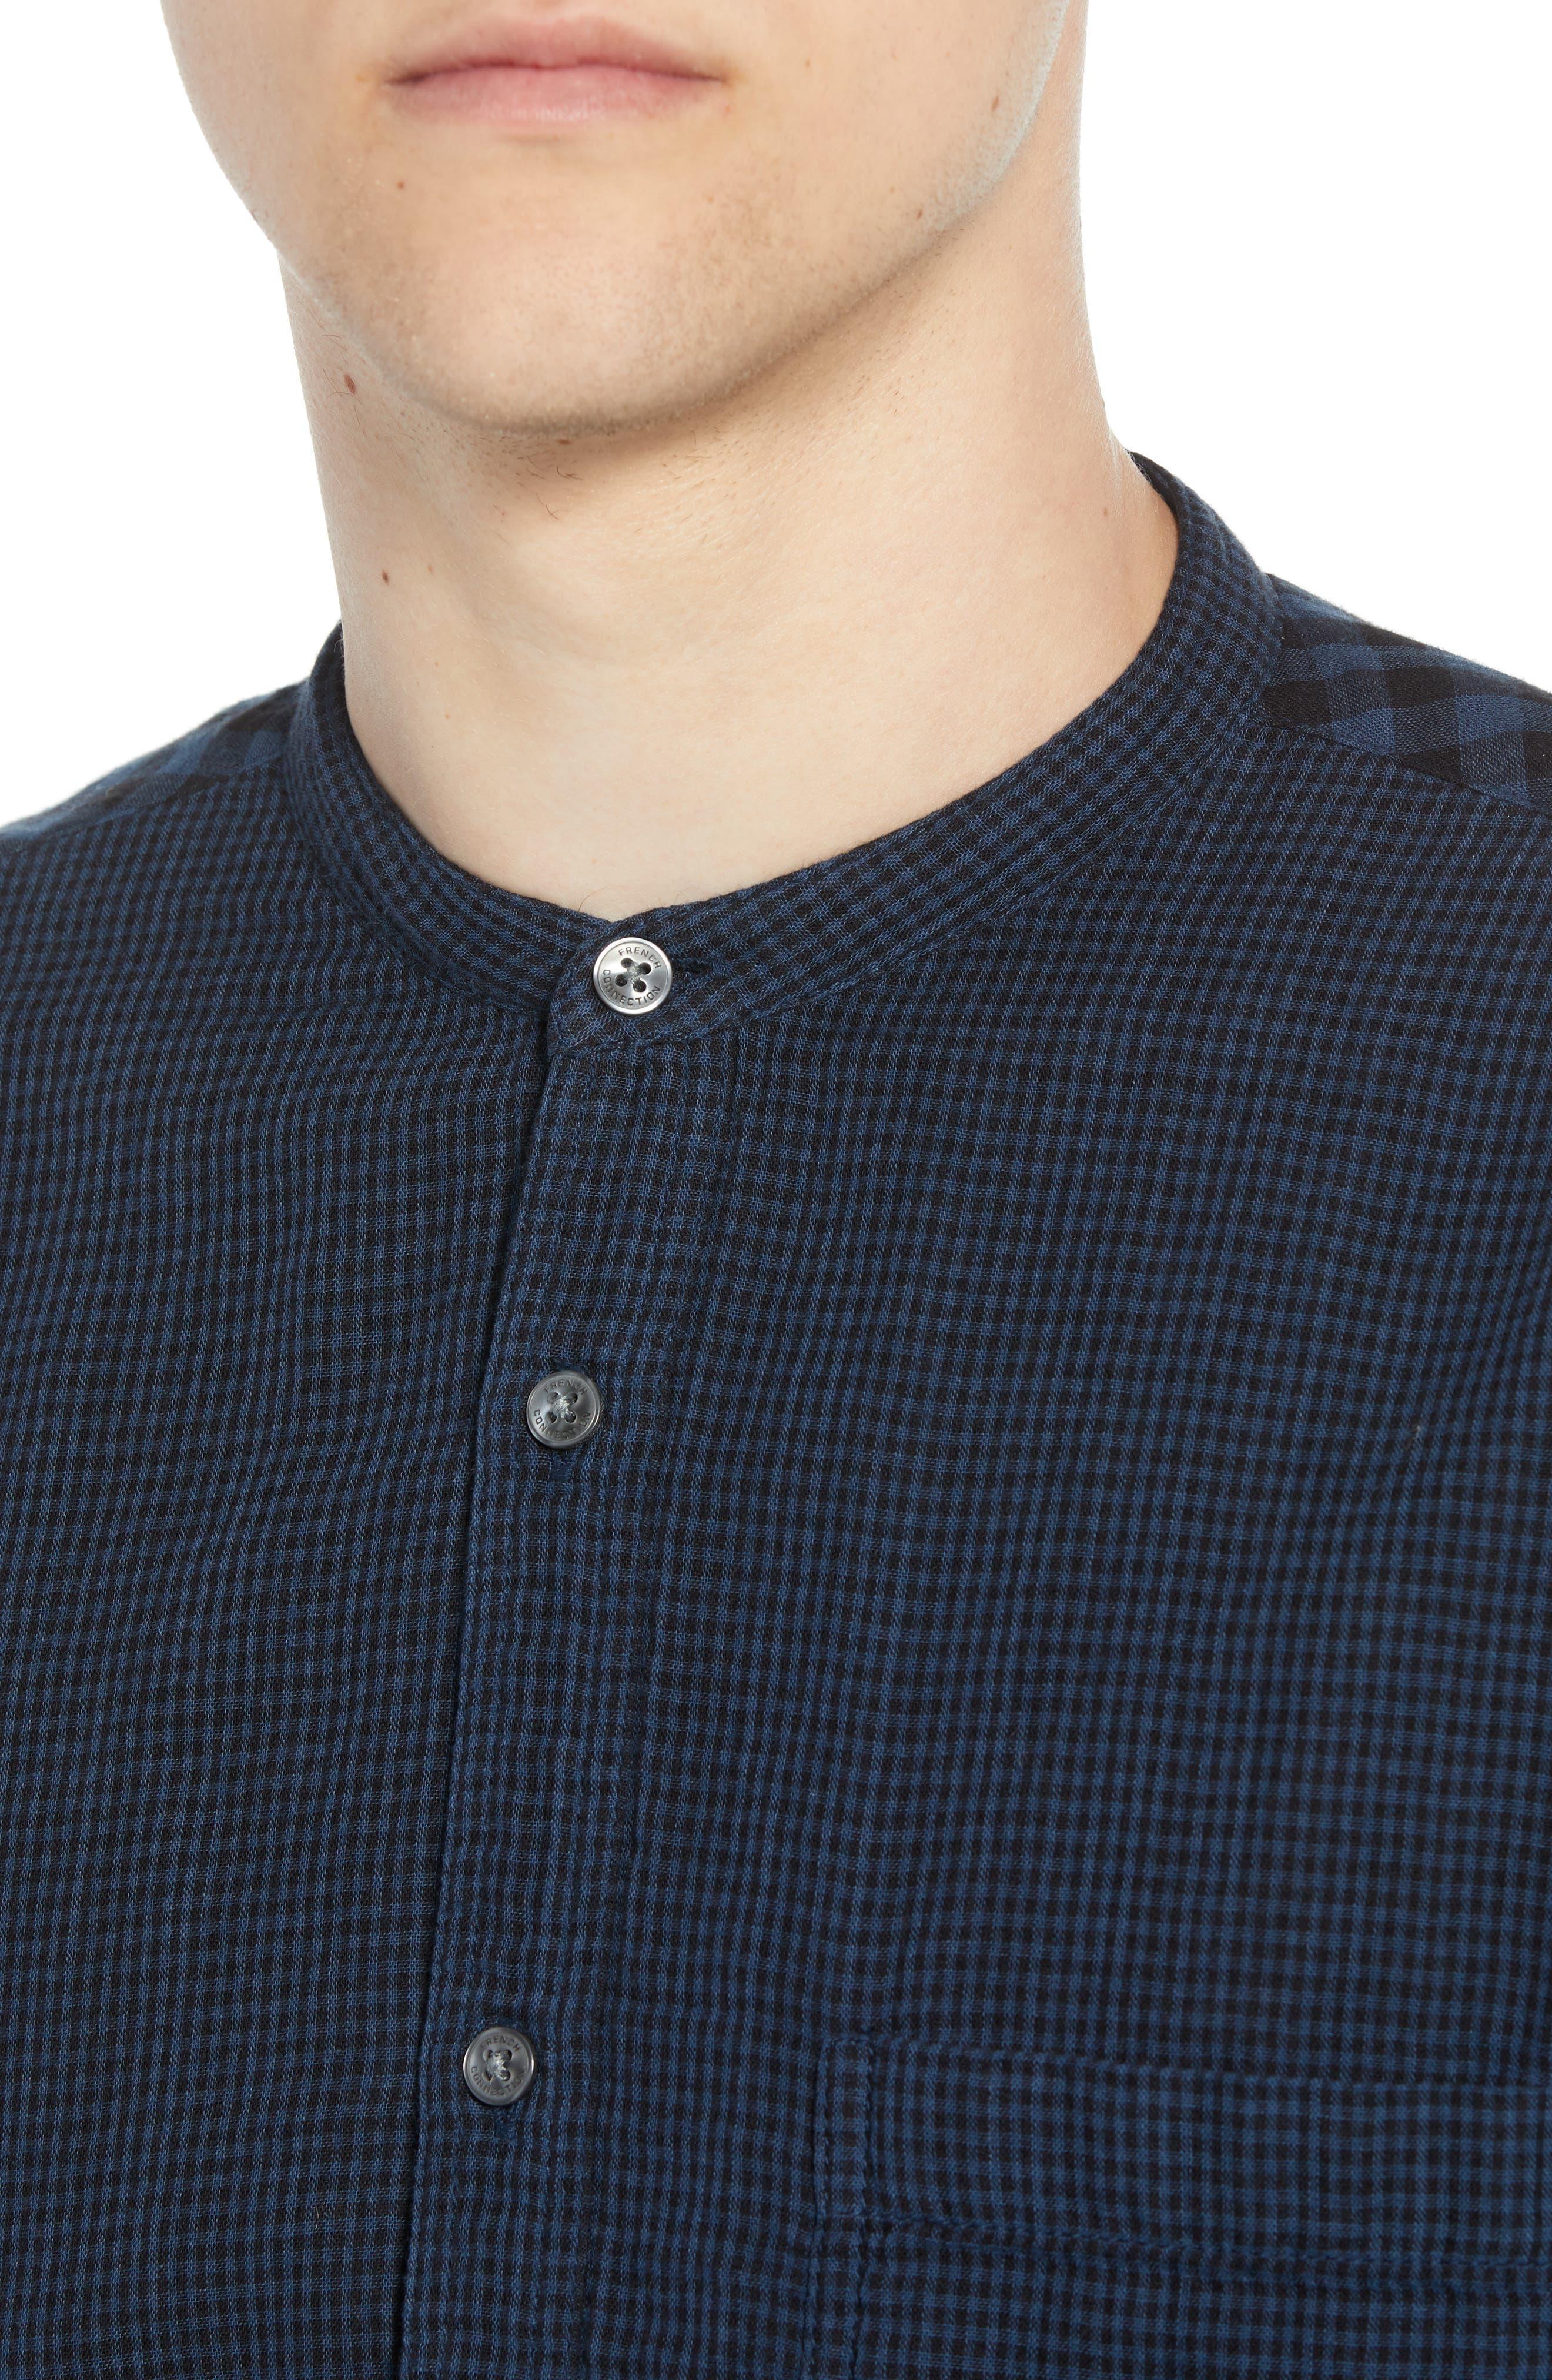 Double Gingham Shirt,                             Alternate thumbnail 2, color,                             BLACK IRIS